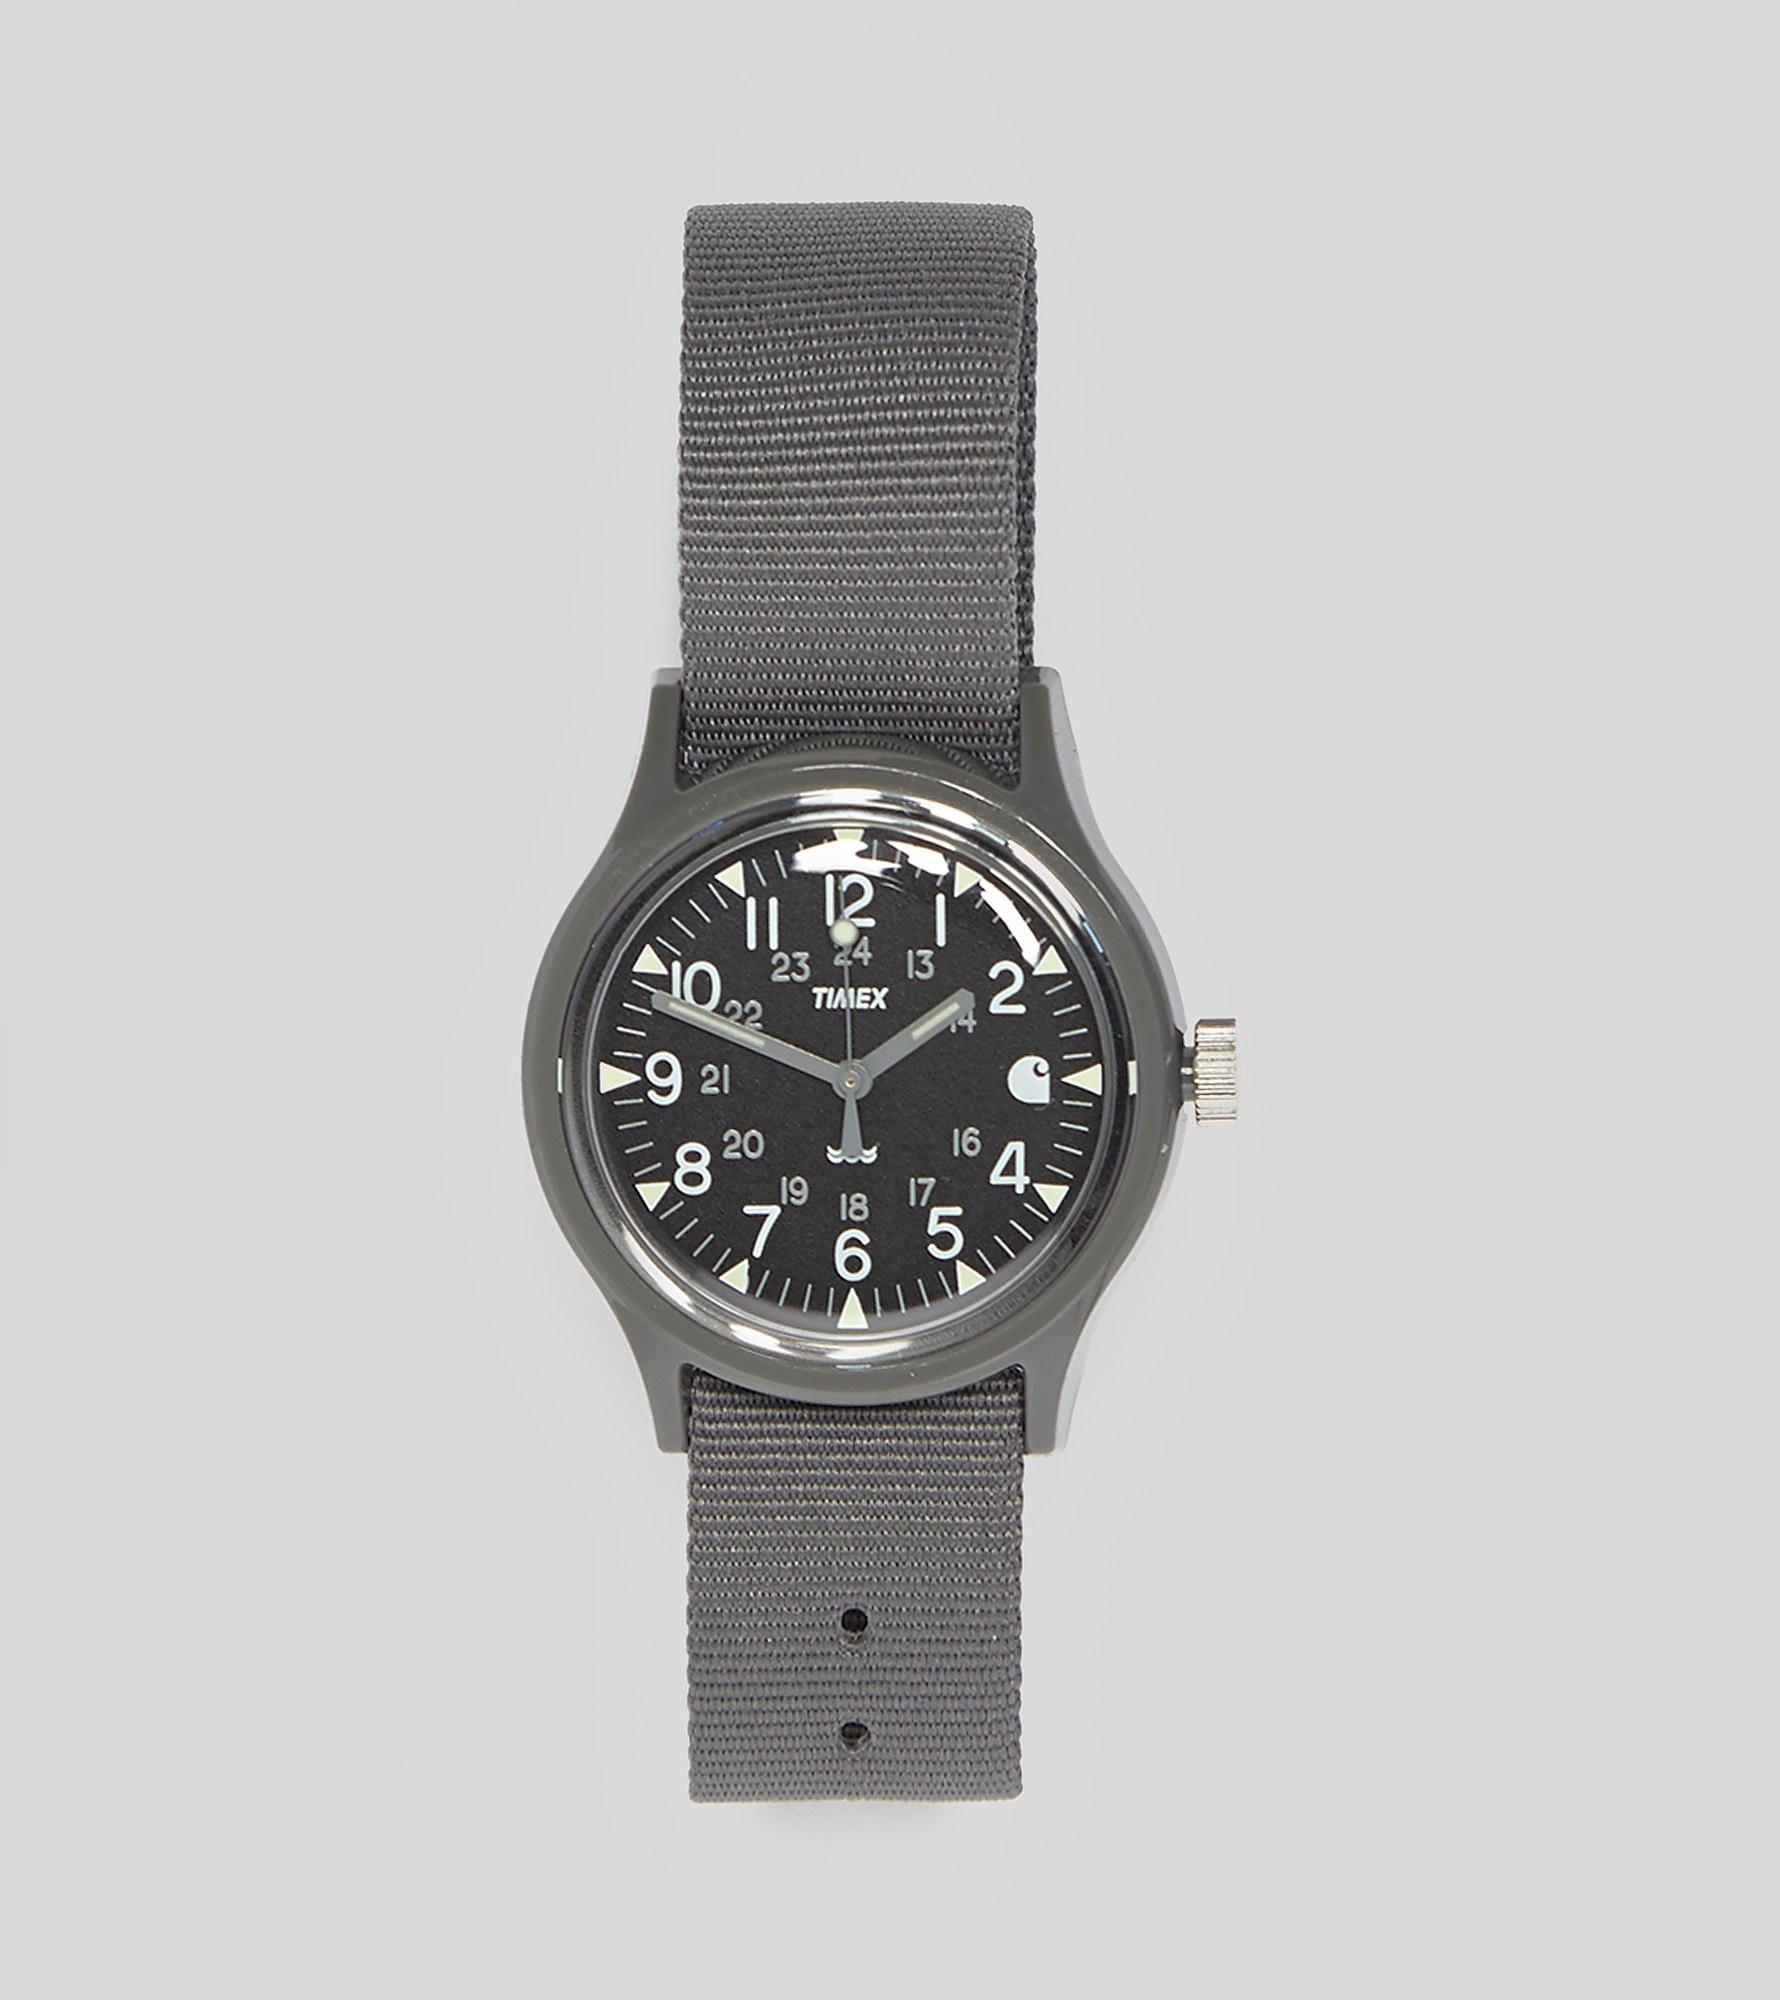 Carhartt WIP x Timex Watch, Grijs